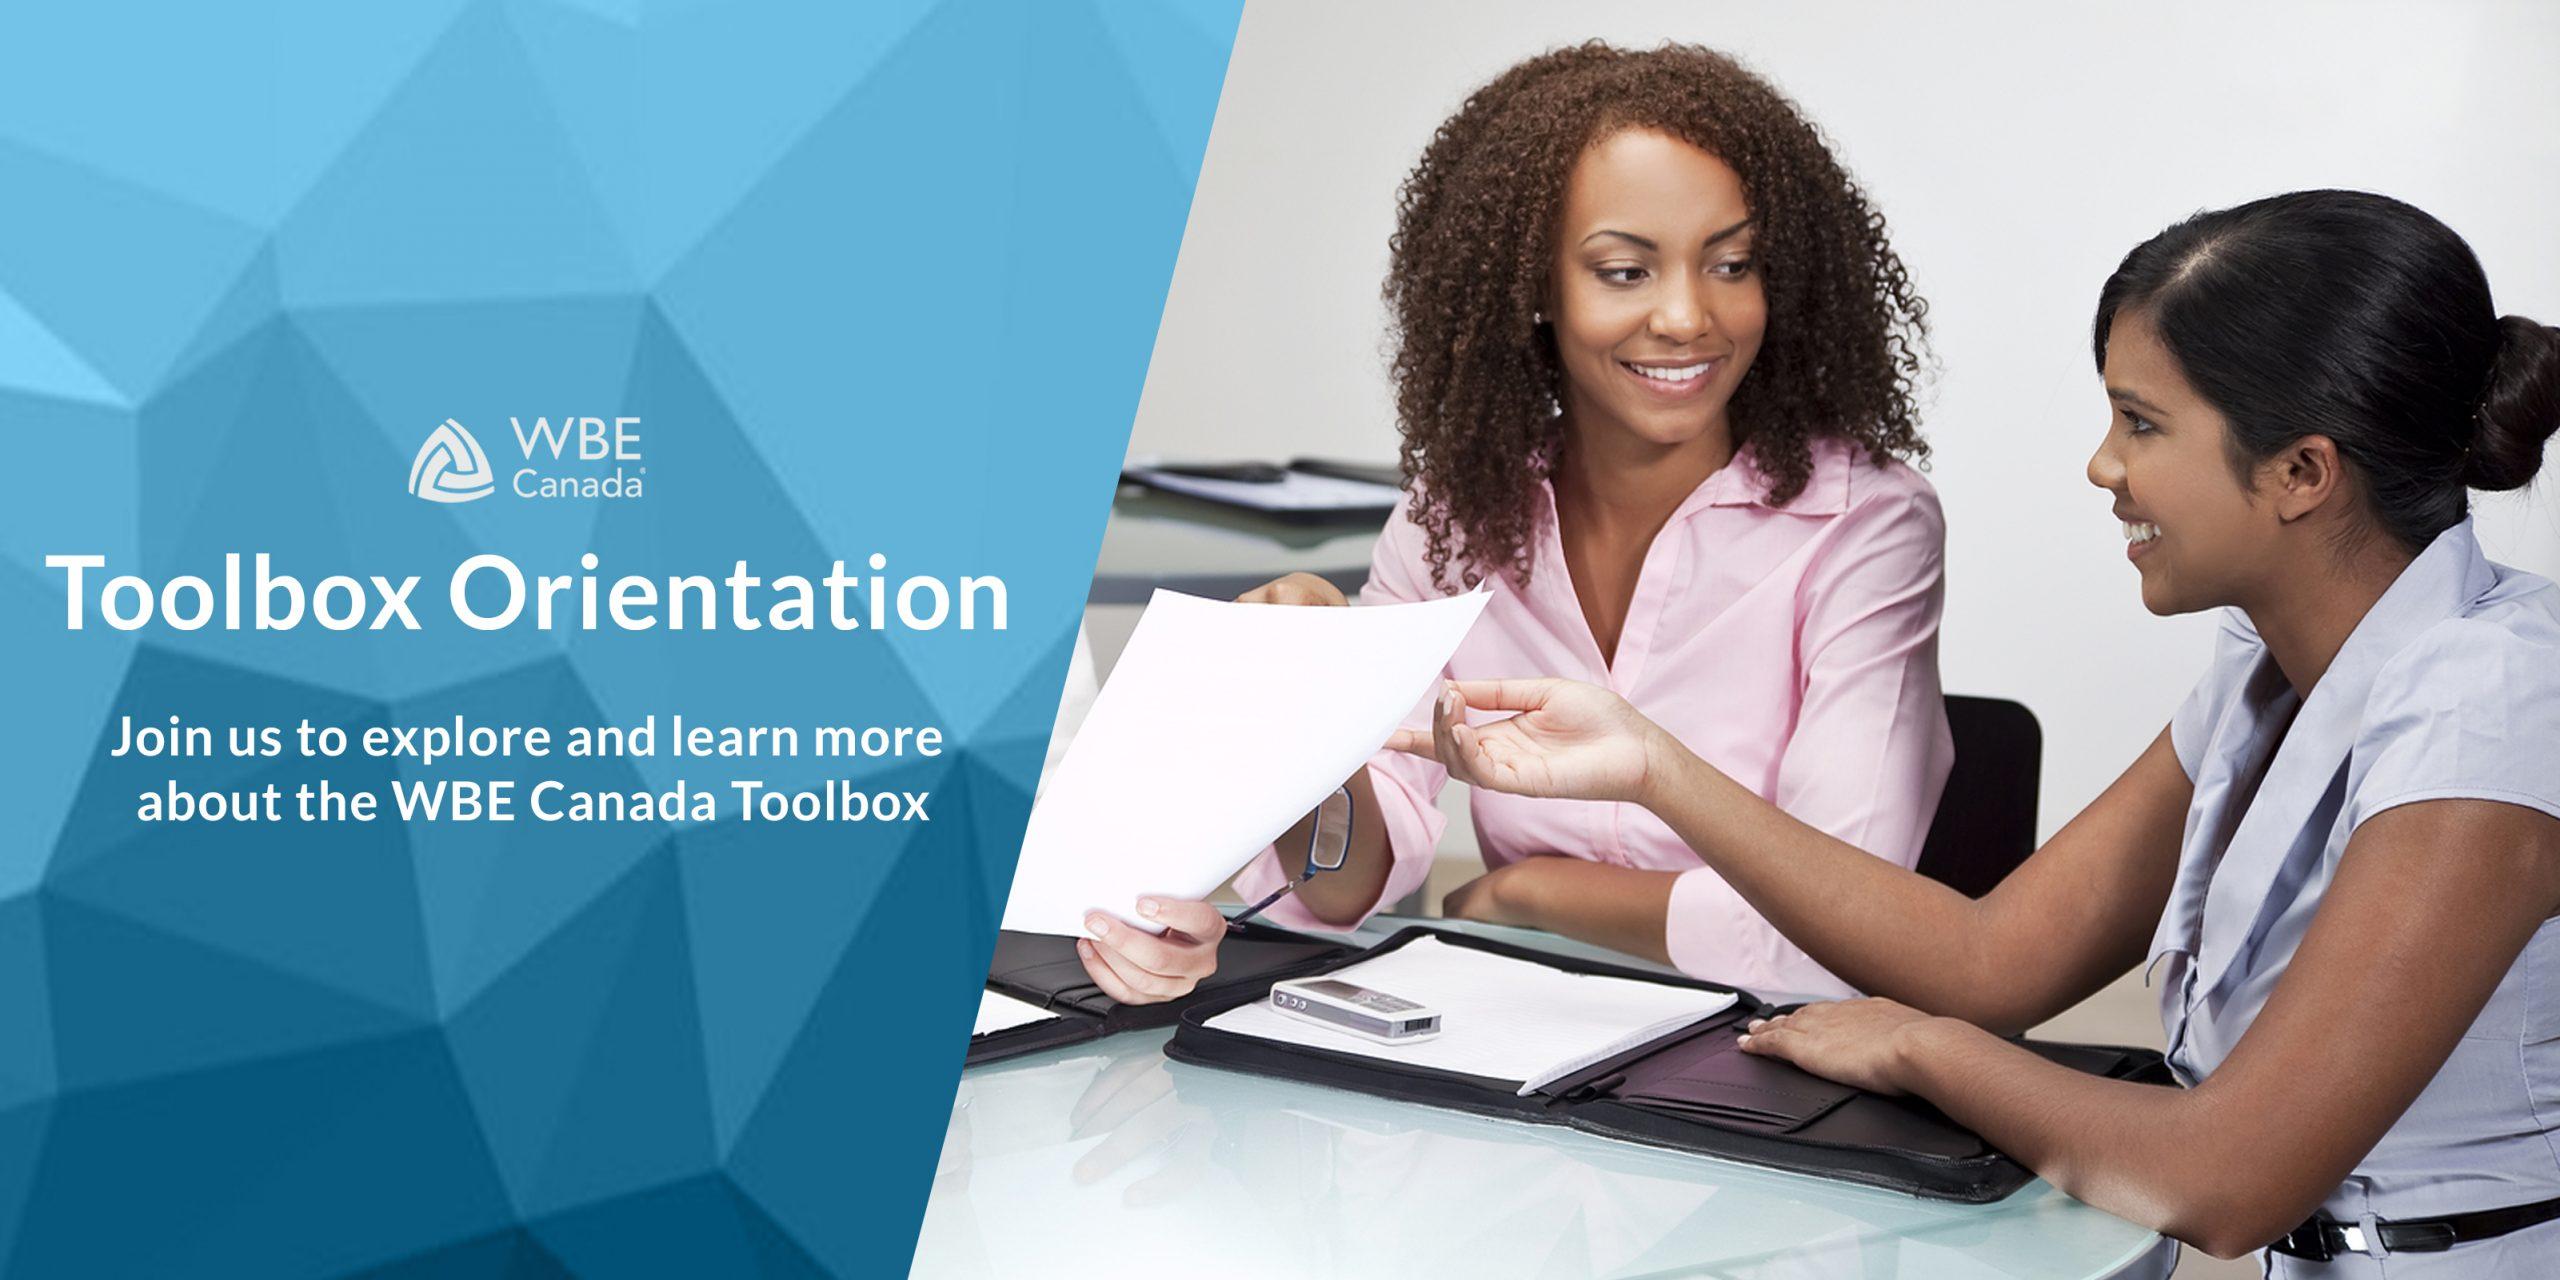 Toolbox Orientation